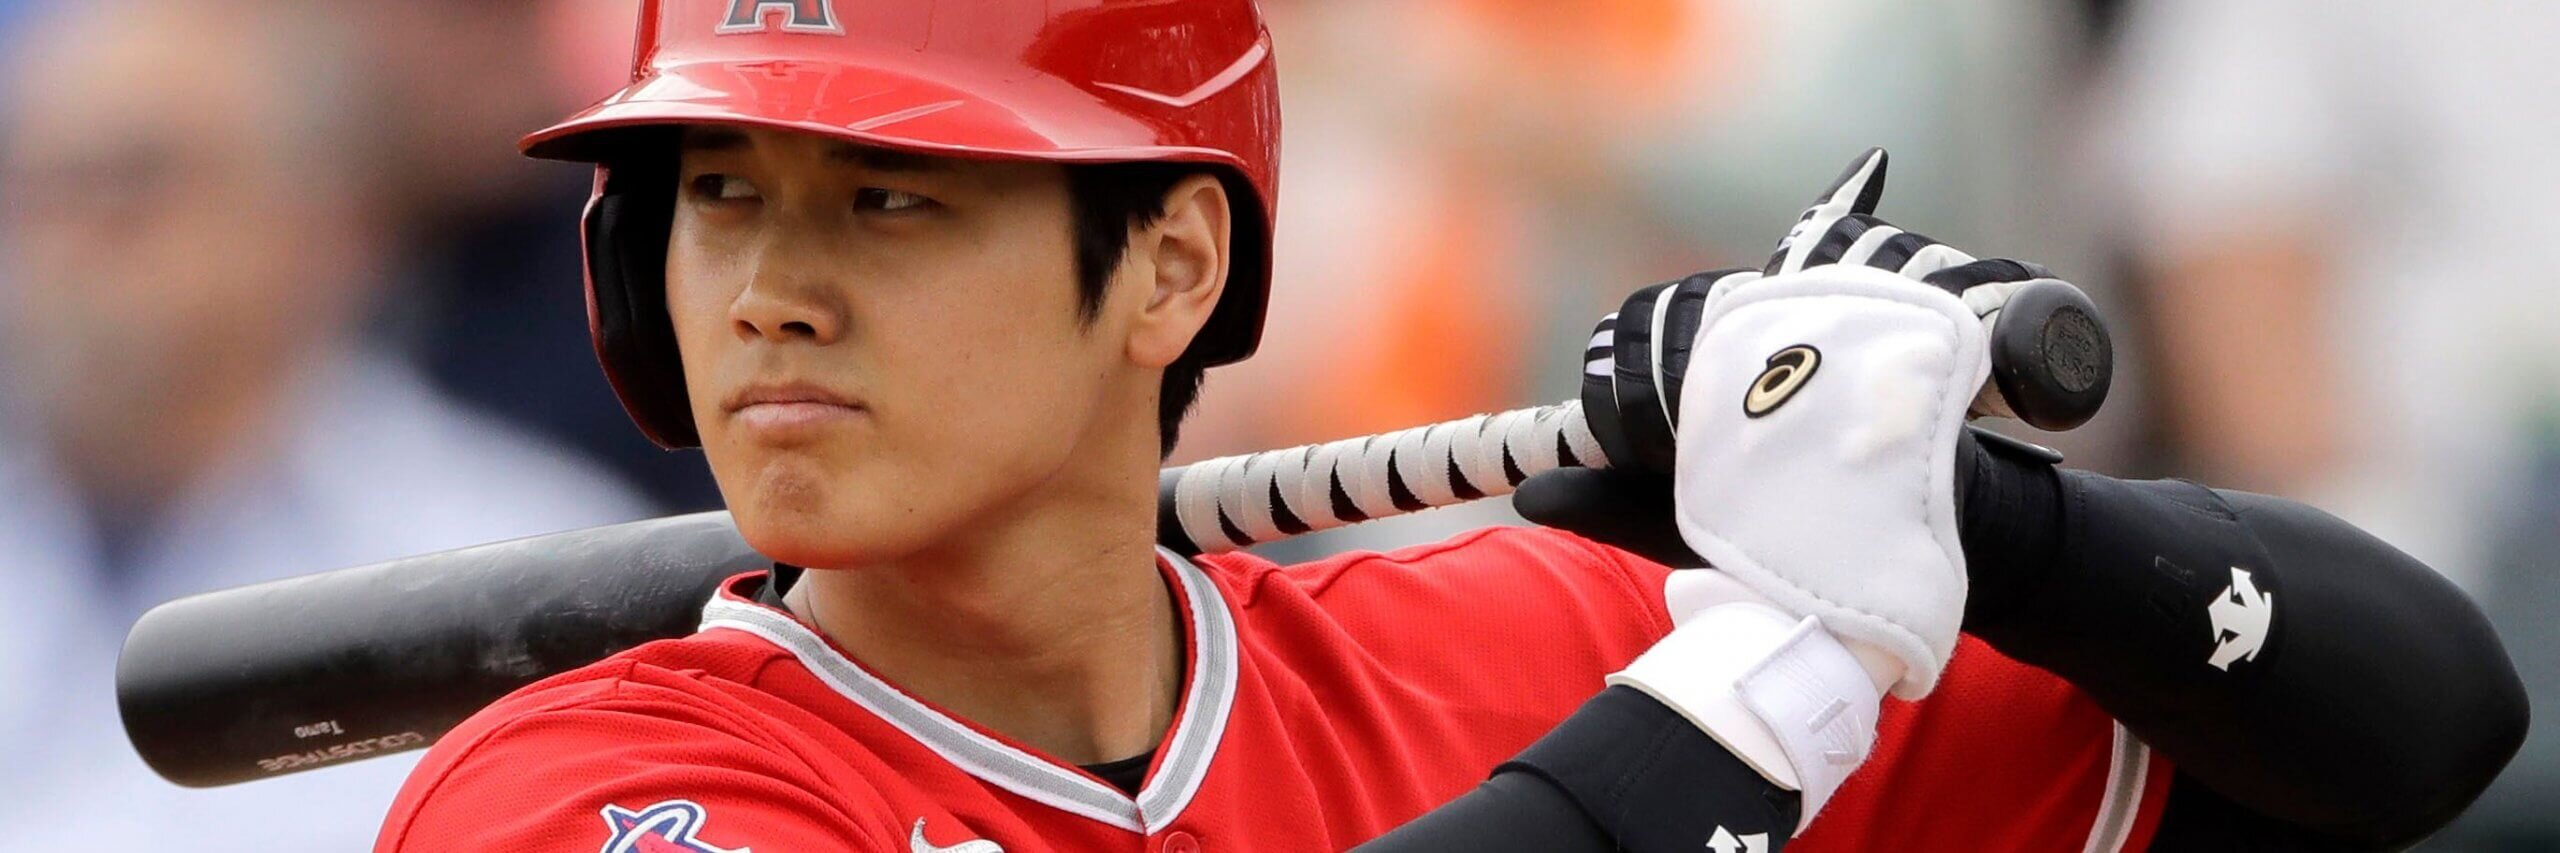 Shohei Ohtani MLB